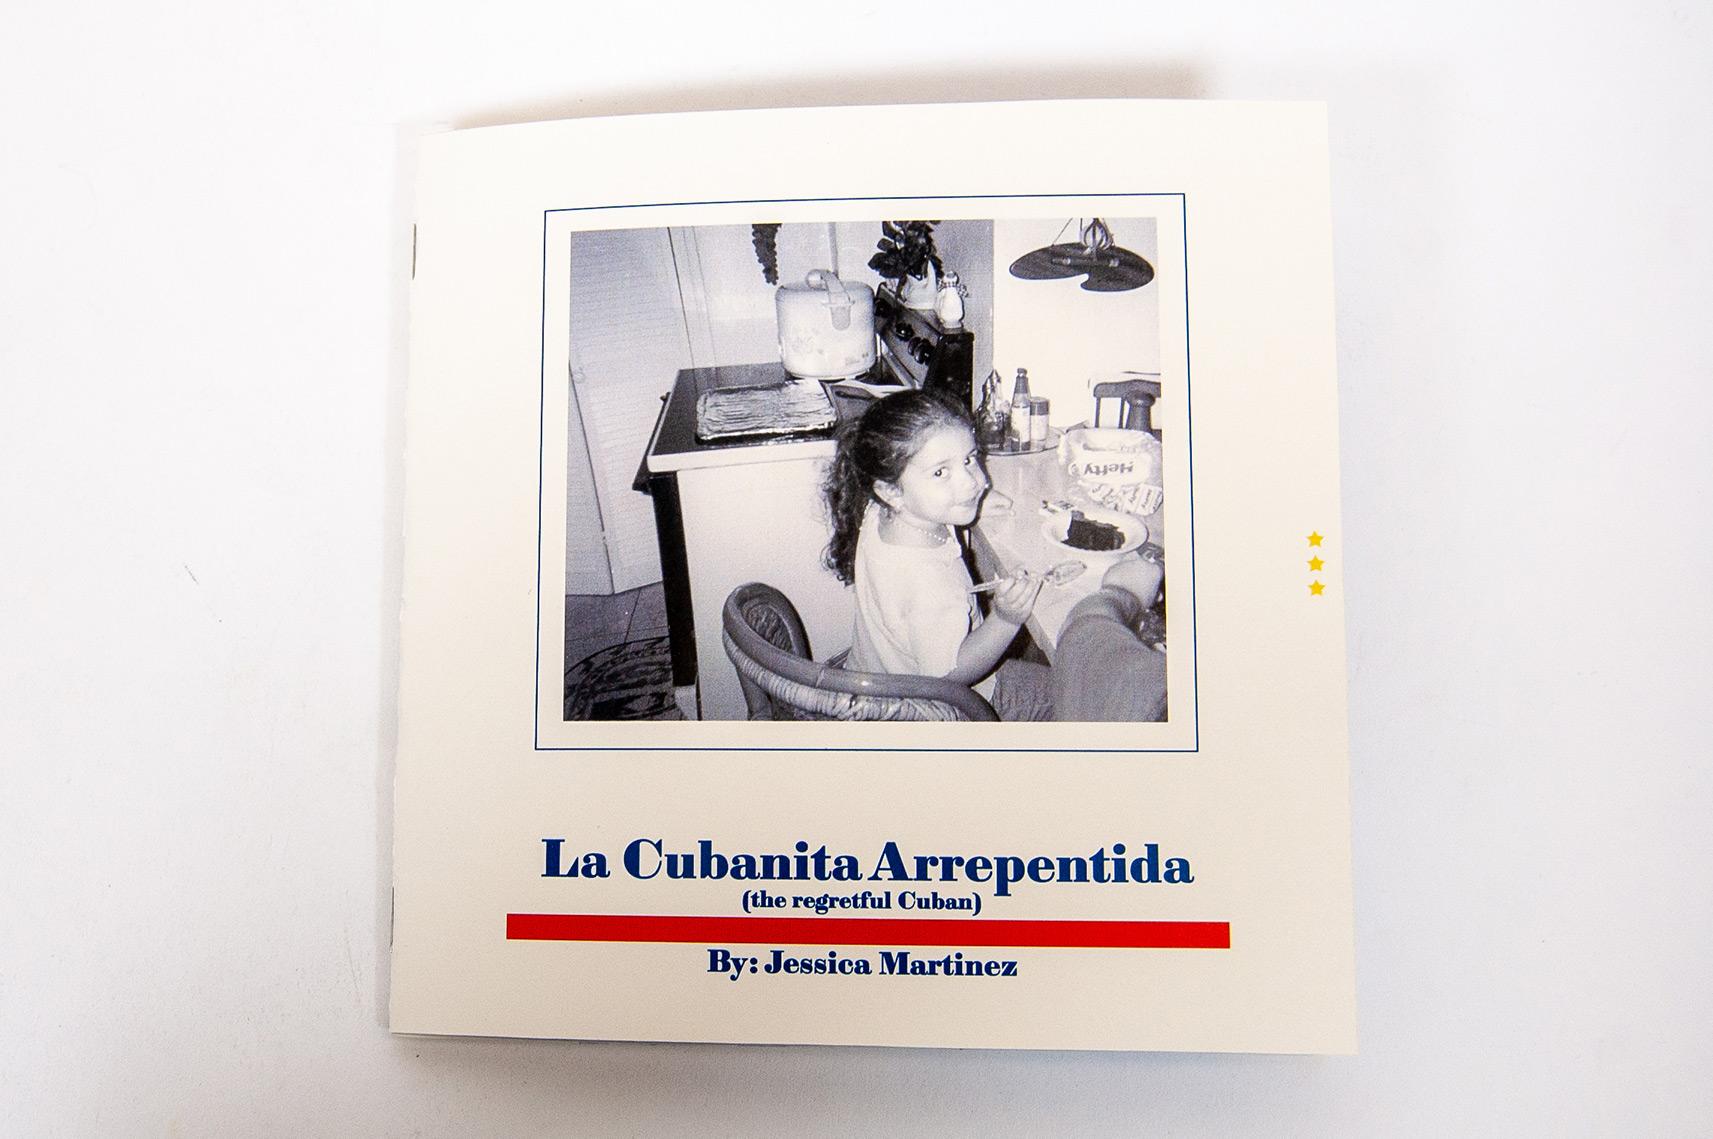 La Cubanita Arrepentida